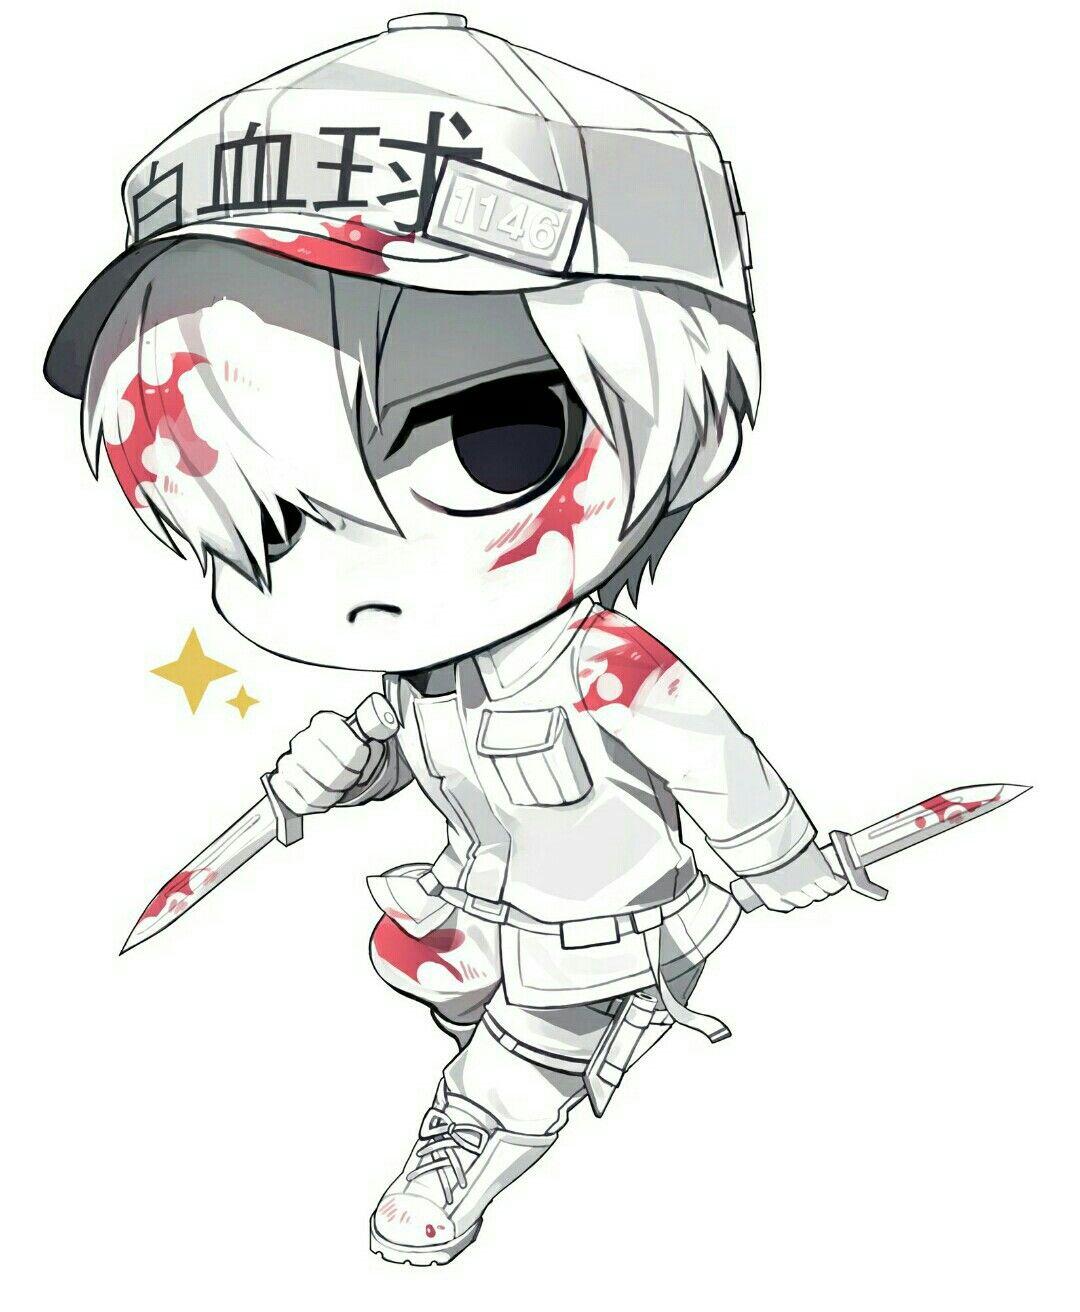 Te gusta el anime Hataraku Saibou? No encuentras muchas